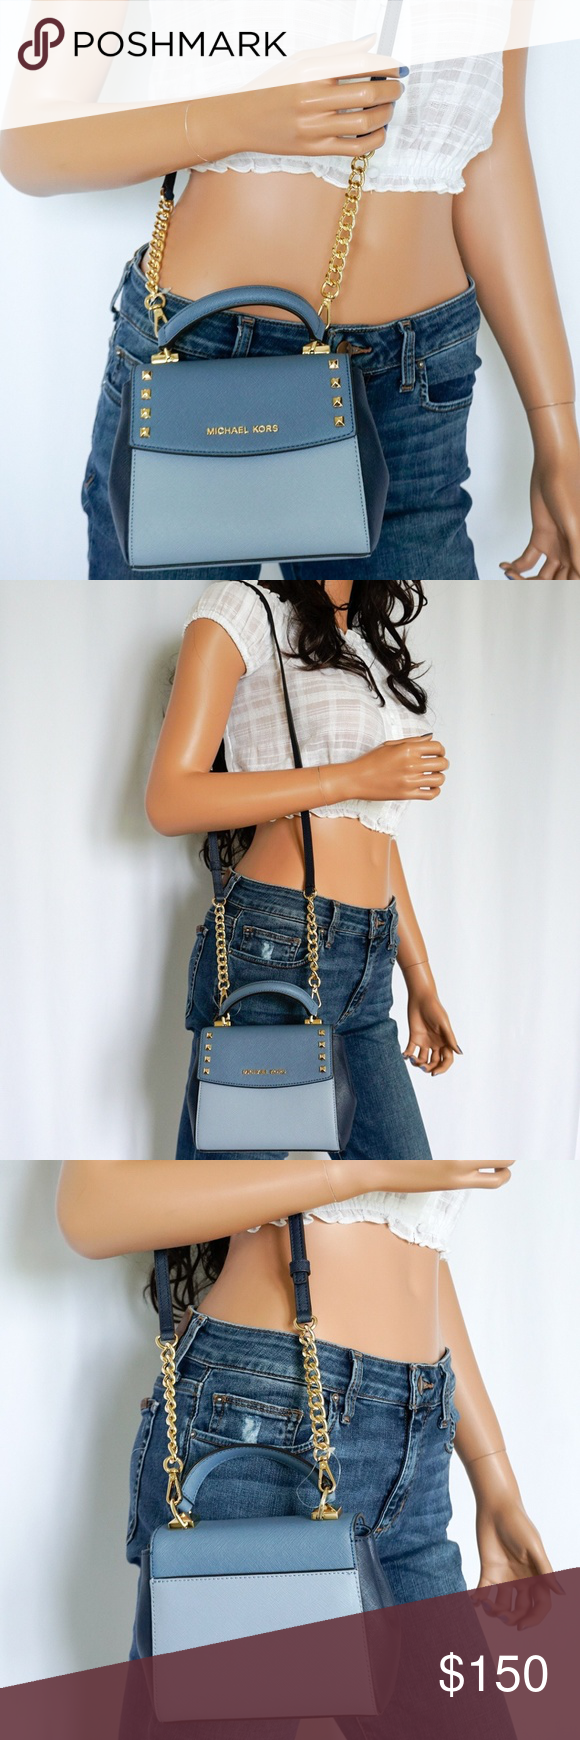 2d86273fb634 Michael Kors Karla Mini TH Leather Crossbody Bag Denim Pale Blue Saffiano  leather Gold Toned Hardware & Studs Flap Closure Custom Fabric Lining 6.5